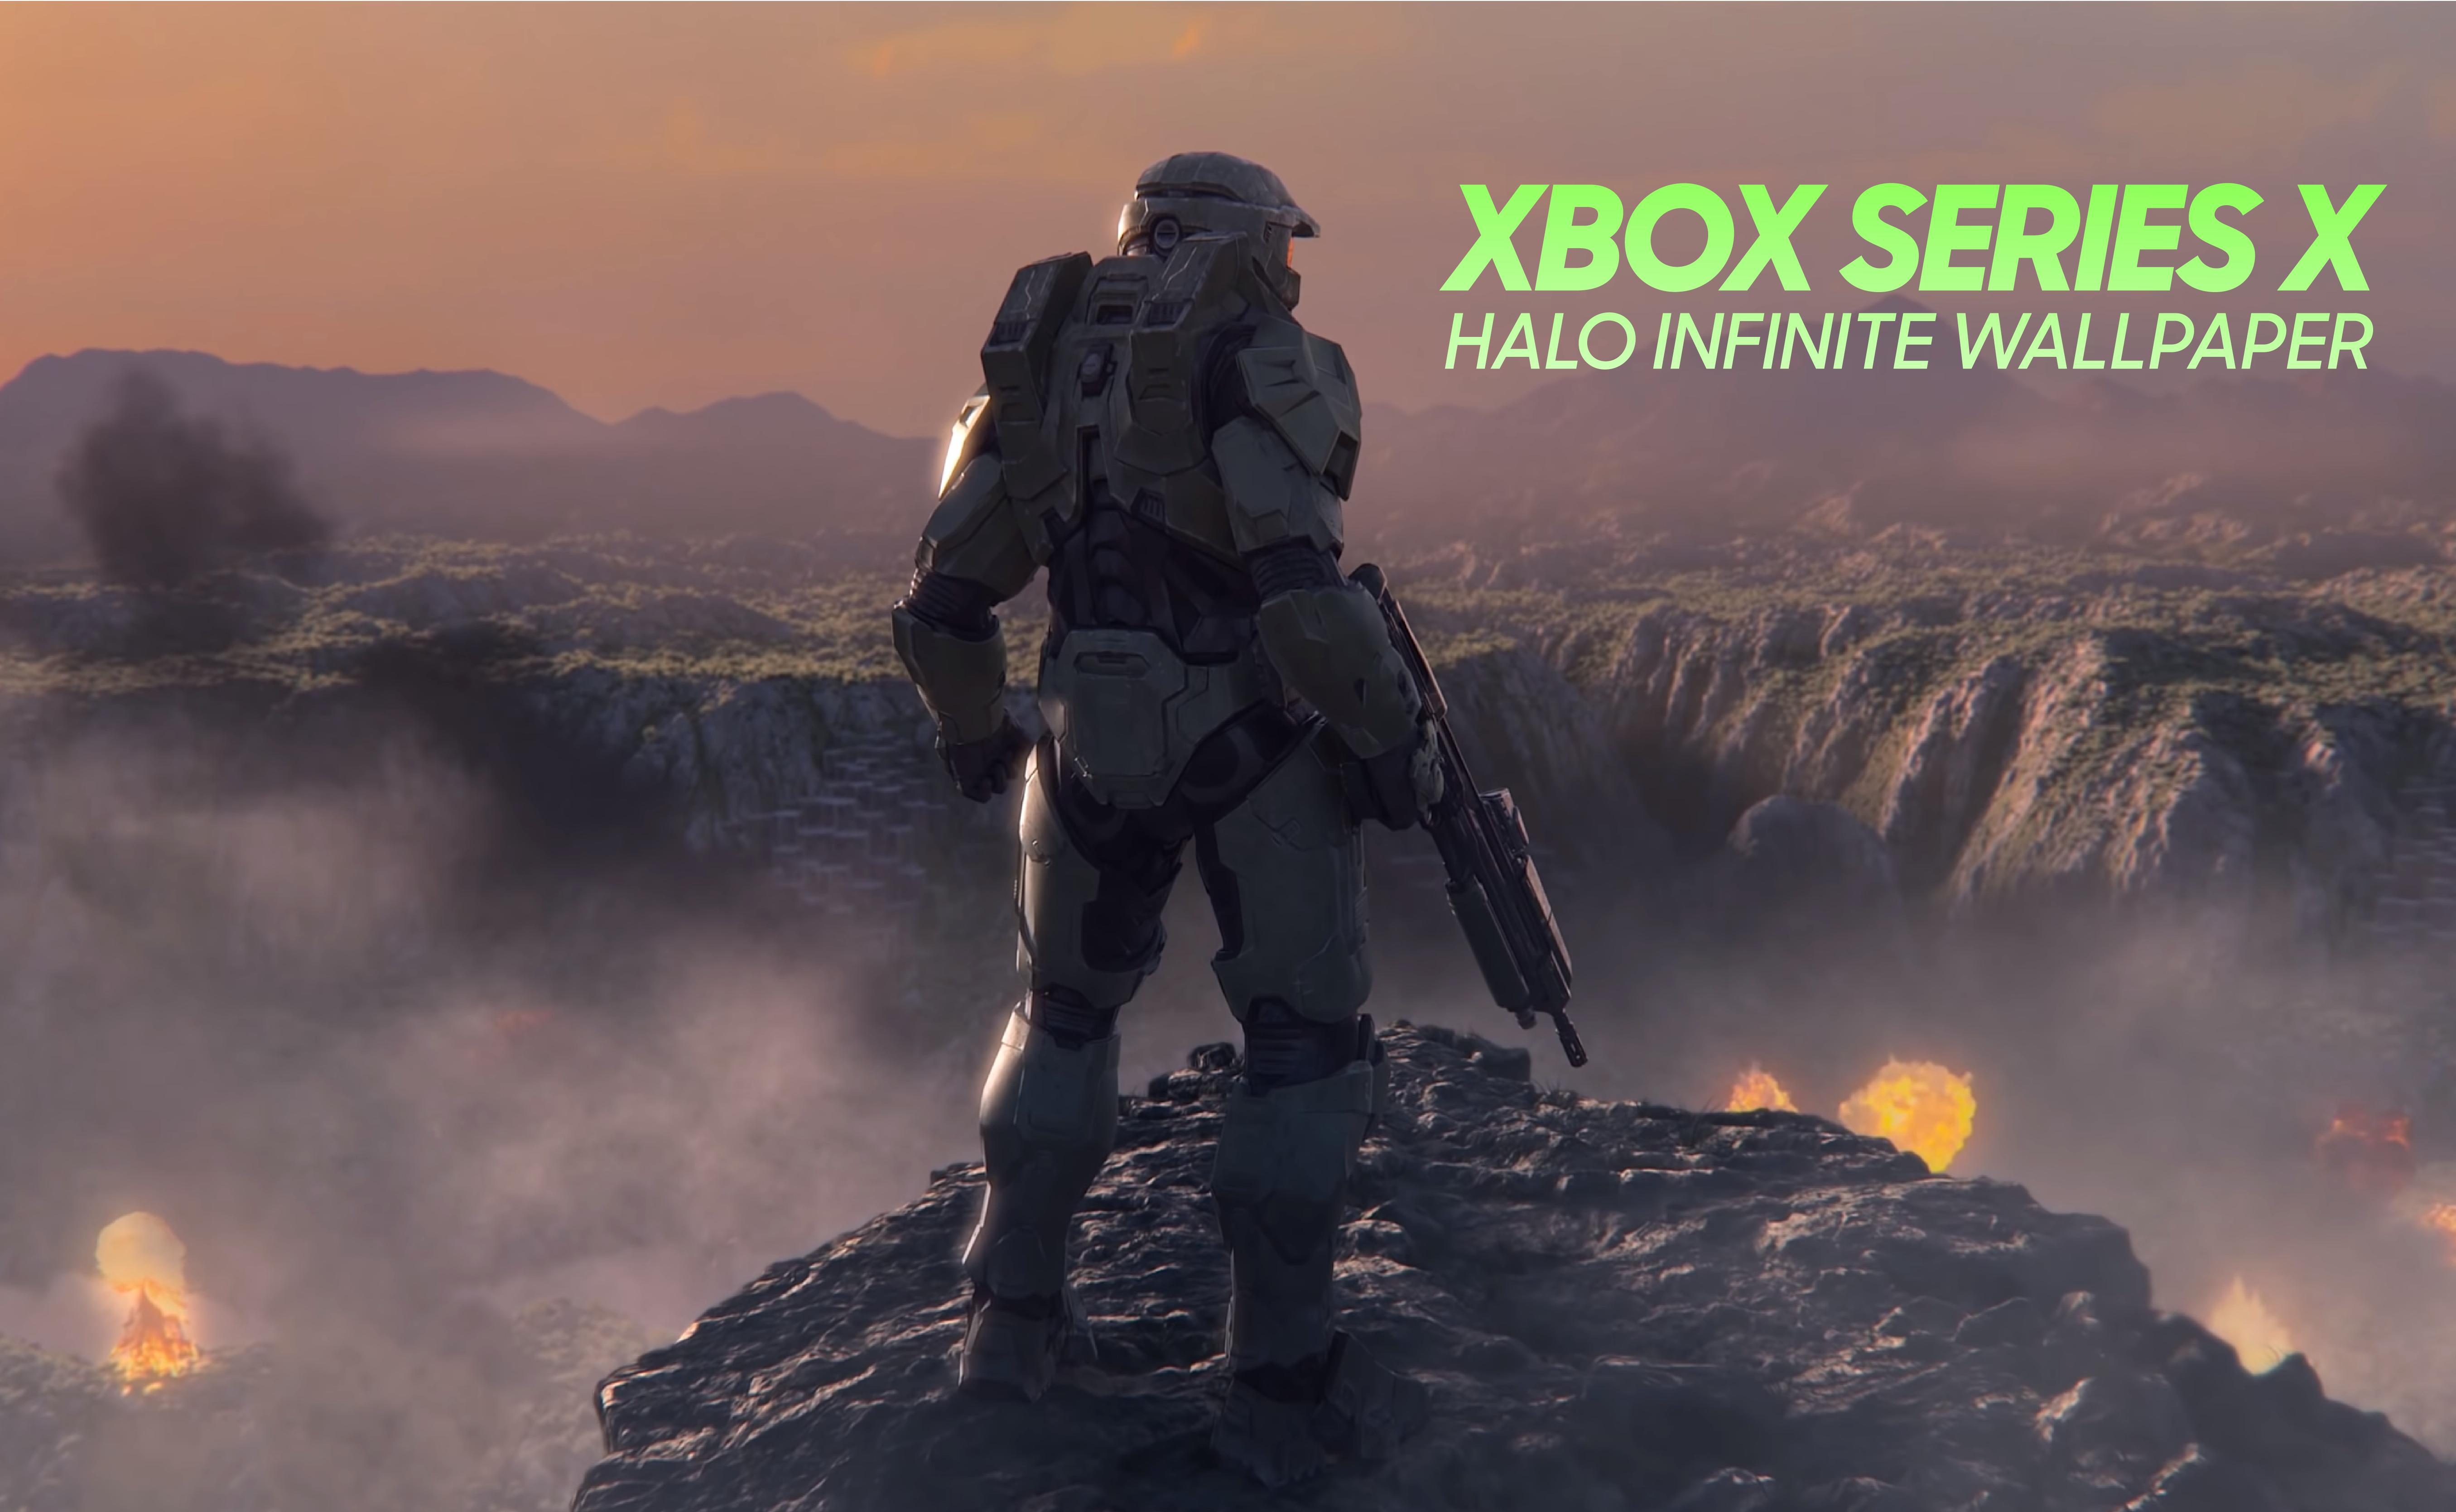 Xbox Series X Halo Infinite Clip 4k Wallpapers Halo United